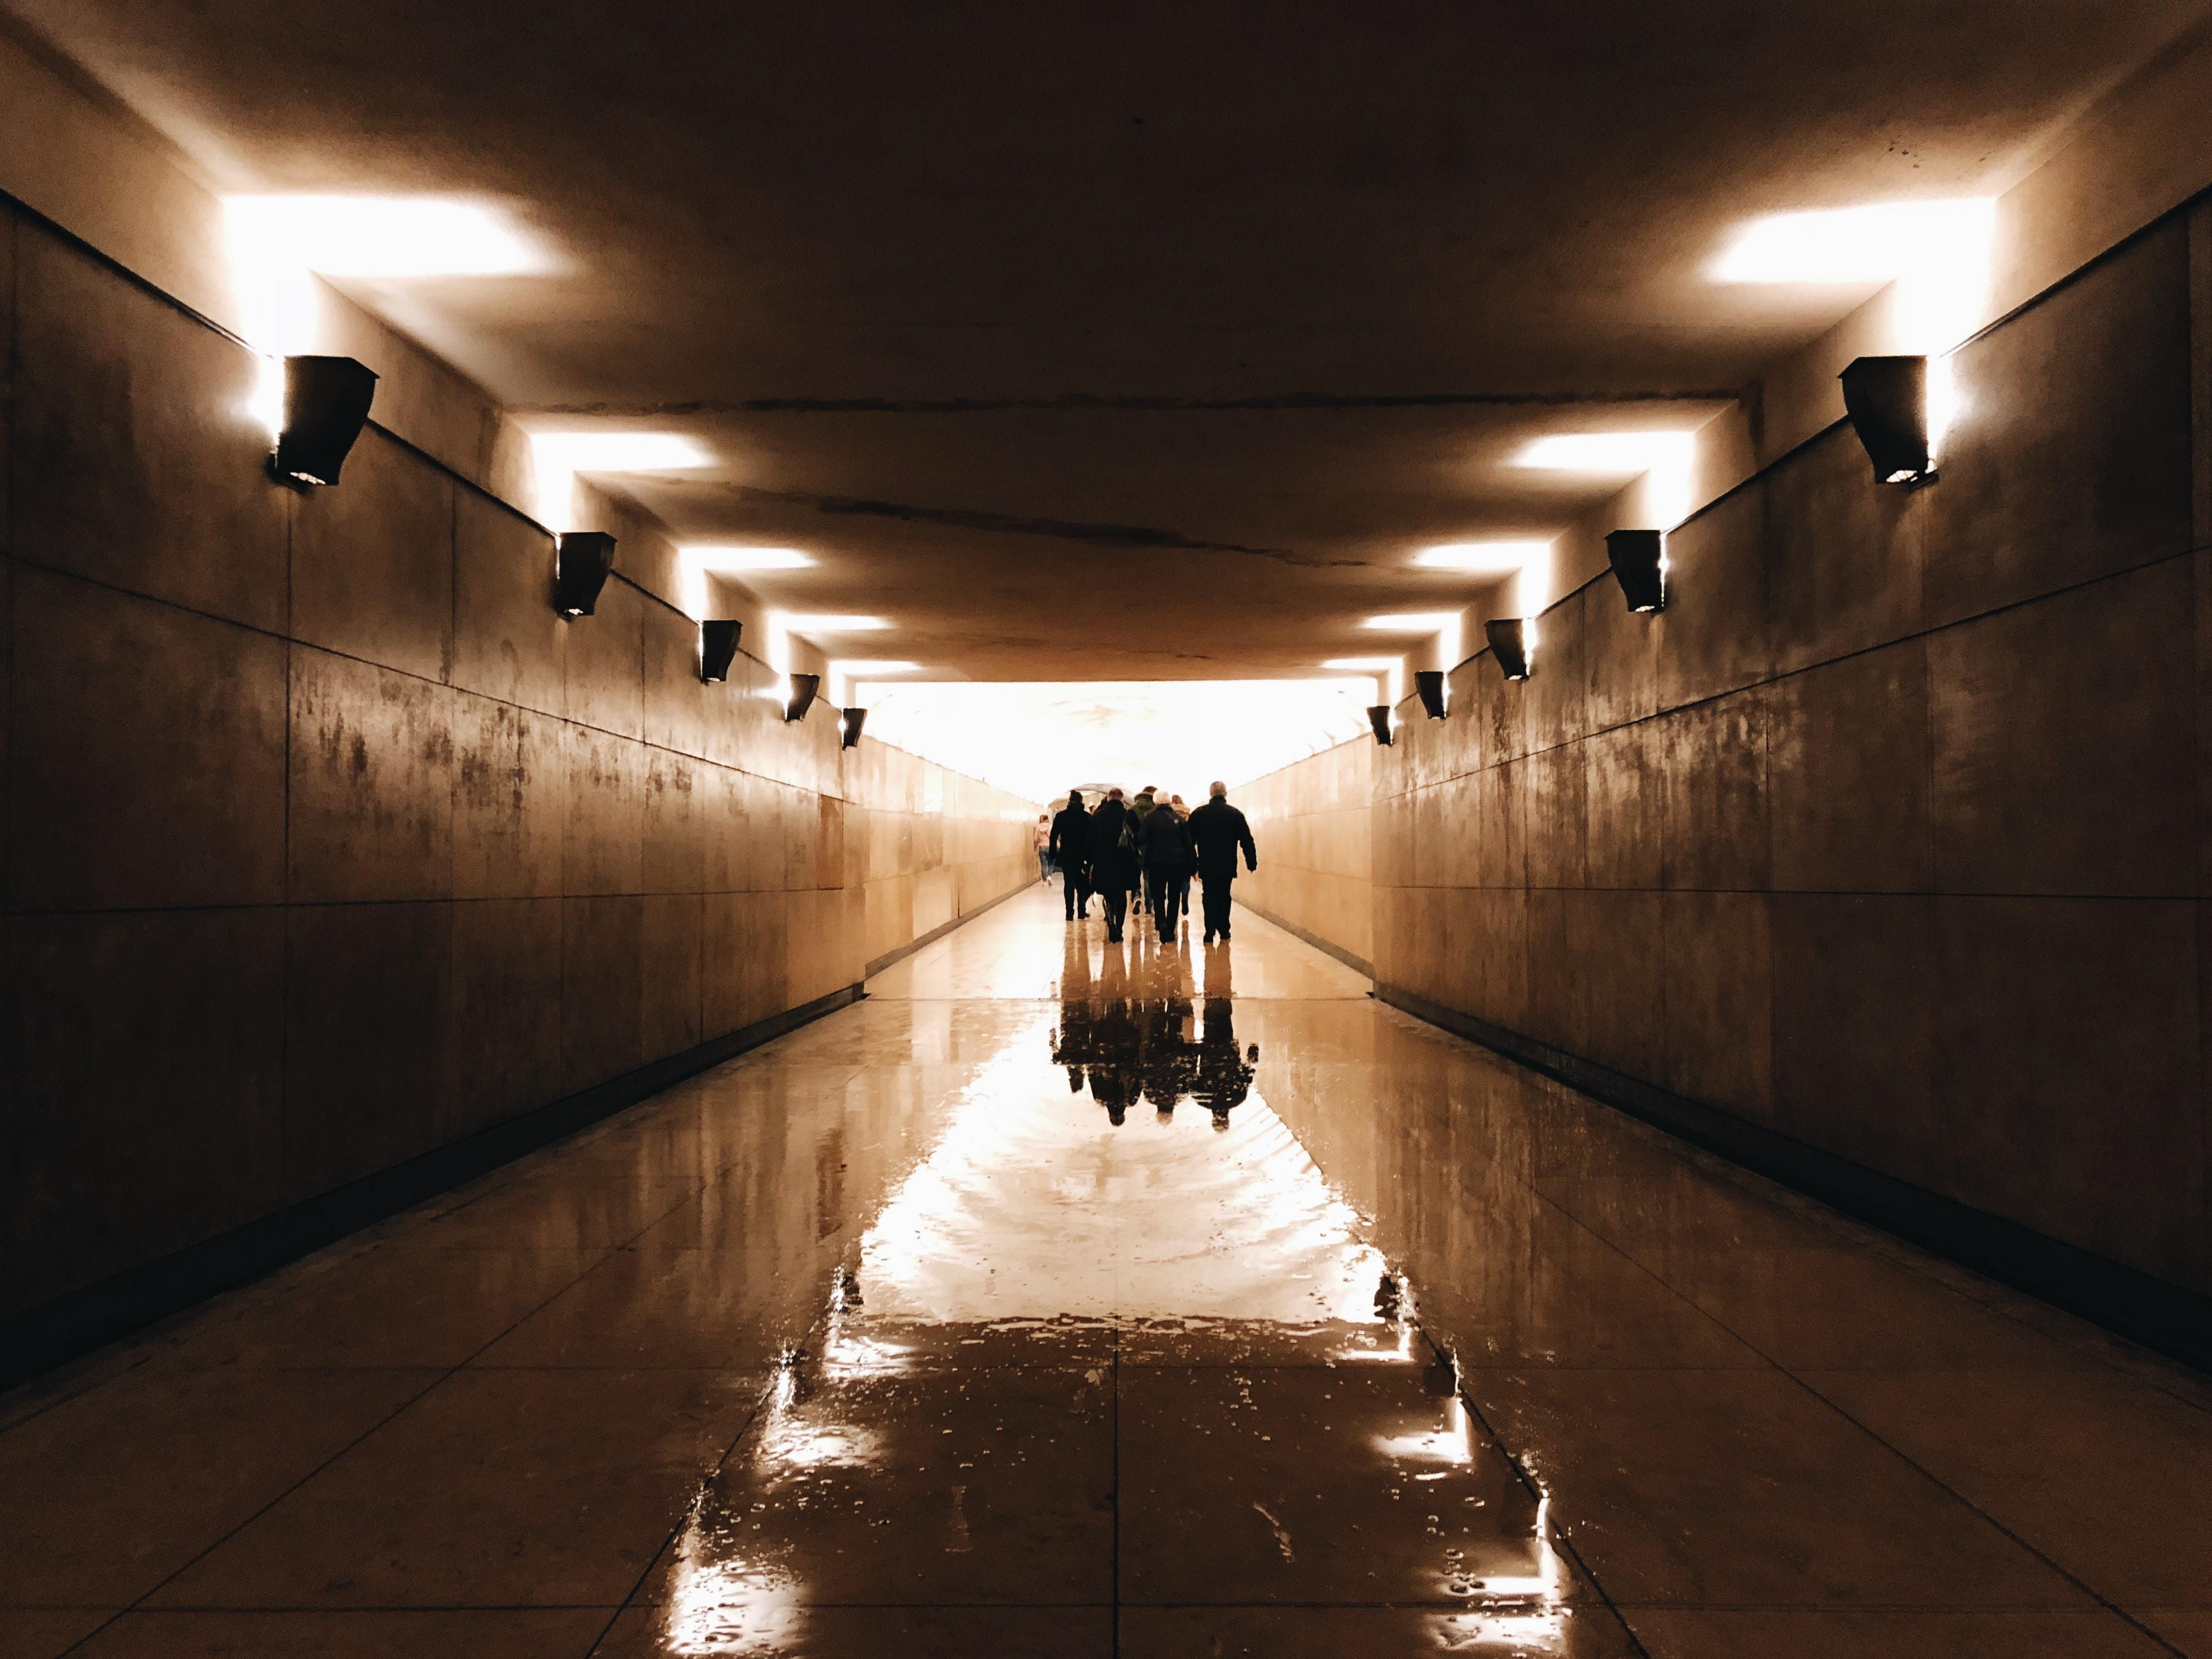 group of people walking on corridor